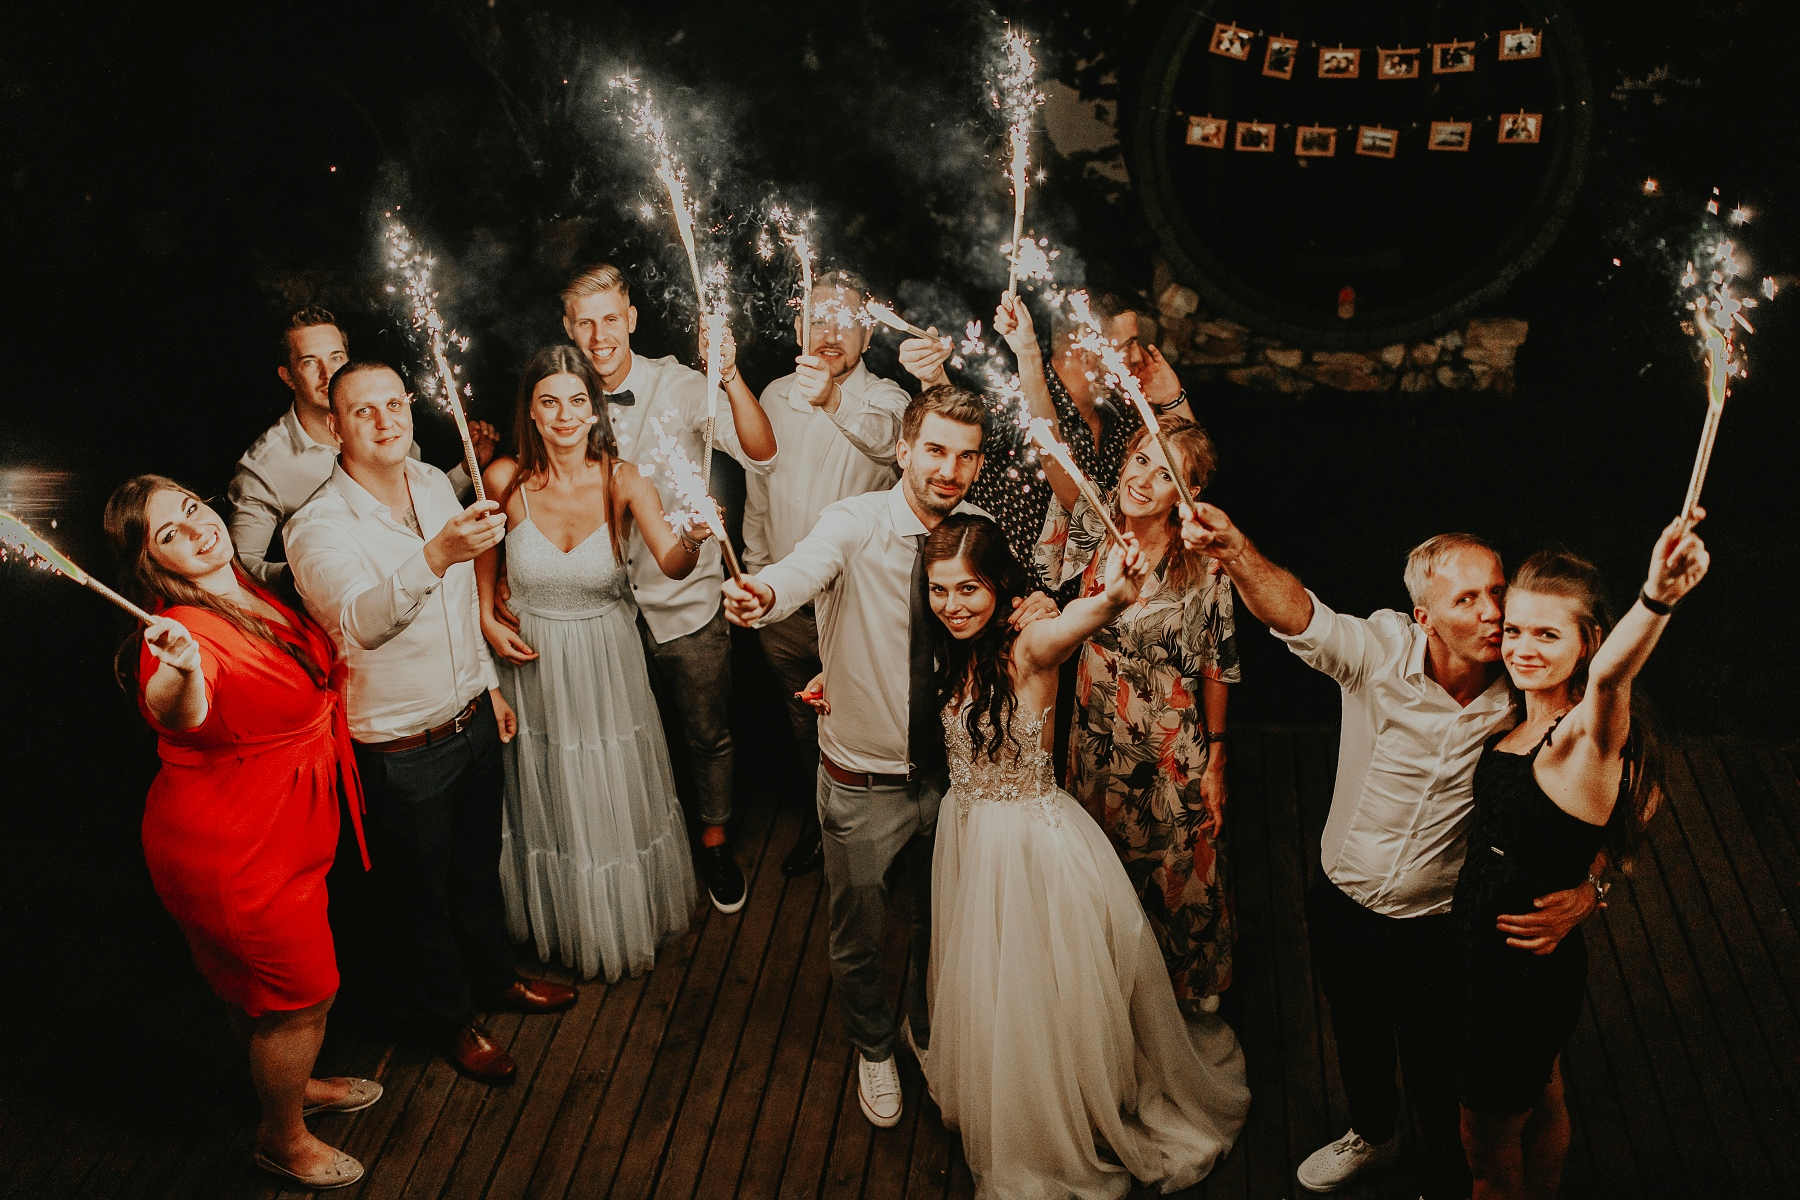 neco modra, svdba v modre, neco estate winery Modra,fotograf lubos krahulec, svadobny fotograf, slovensko, tatry,  fotograf vychod, presov, kosice, poprad, michalovce, bardejov, kameraman,  najlepsie svadobne fotky